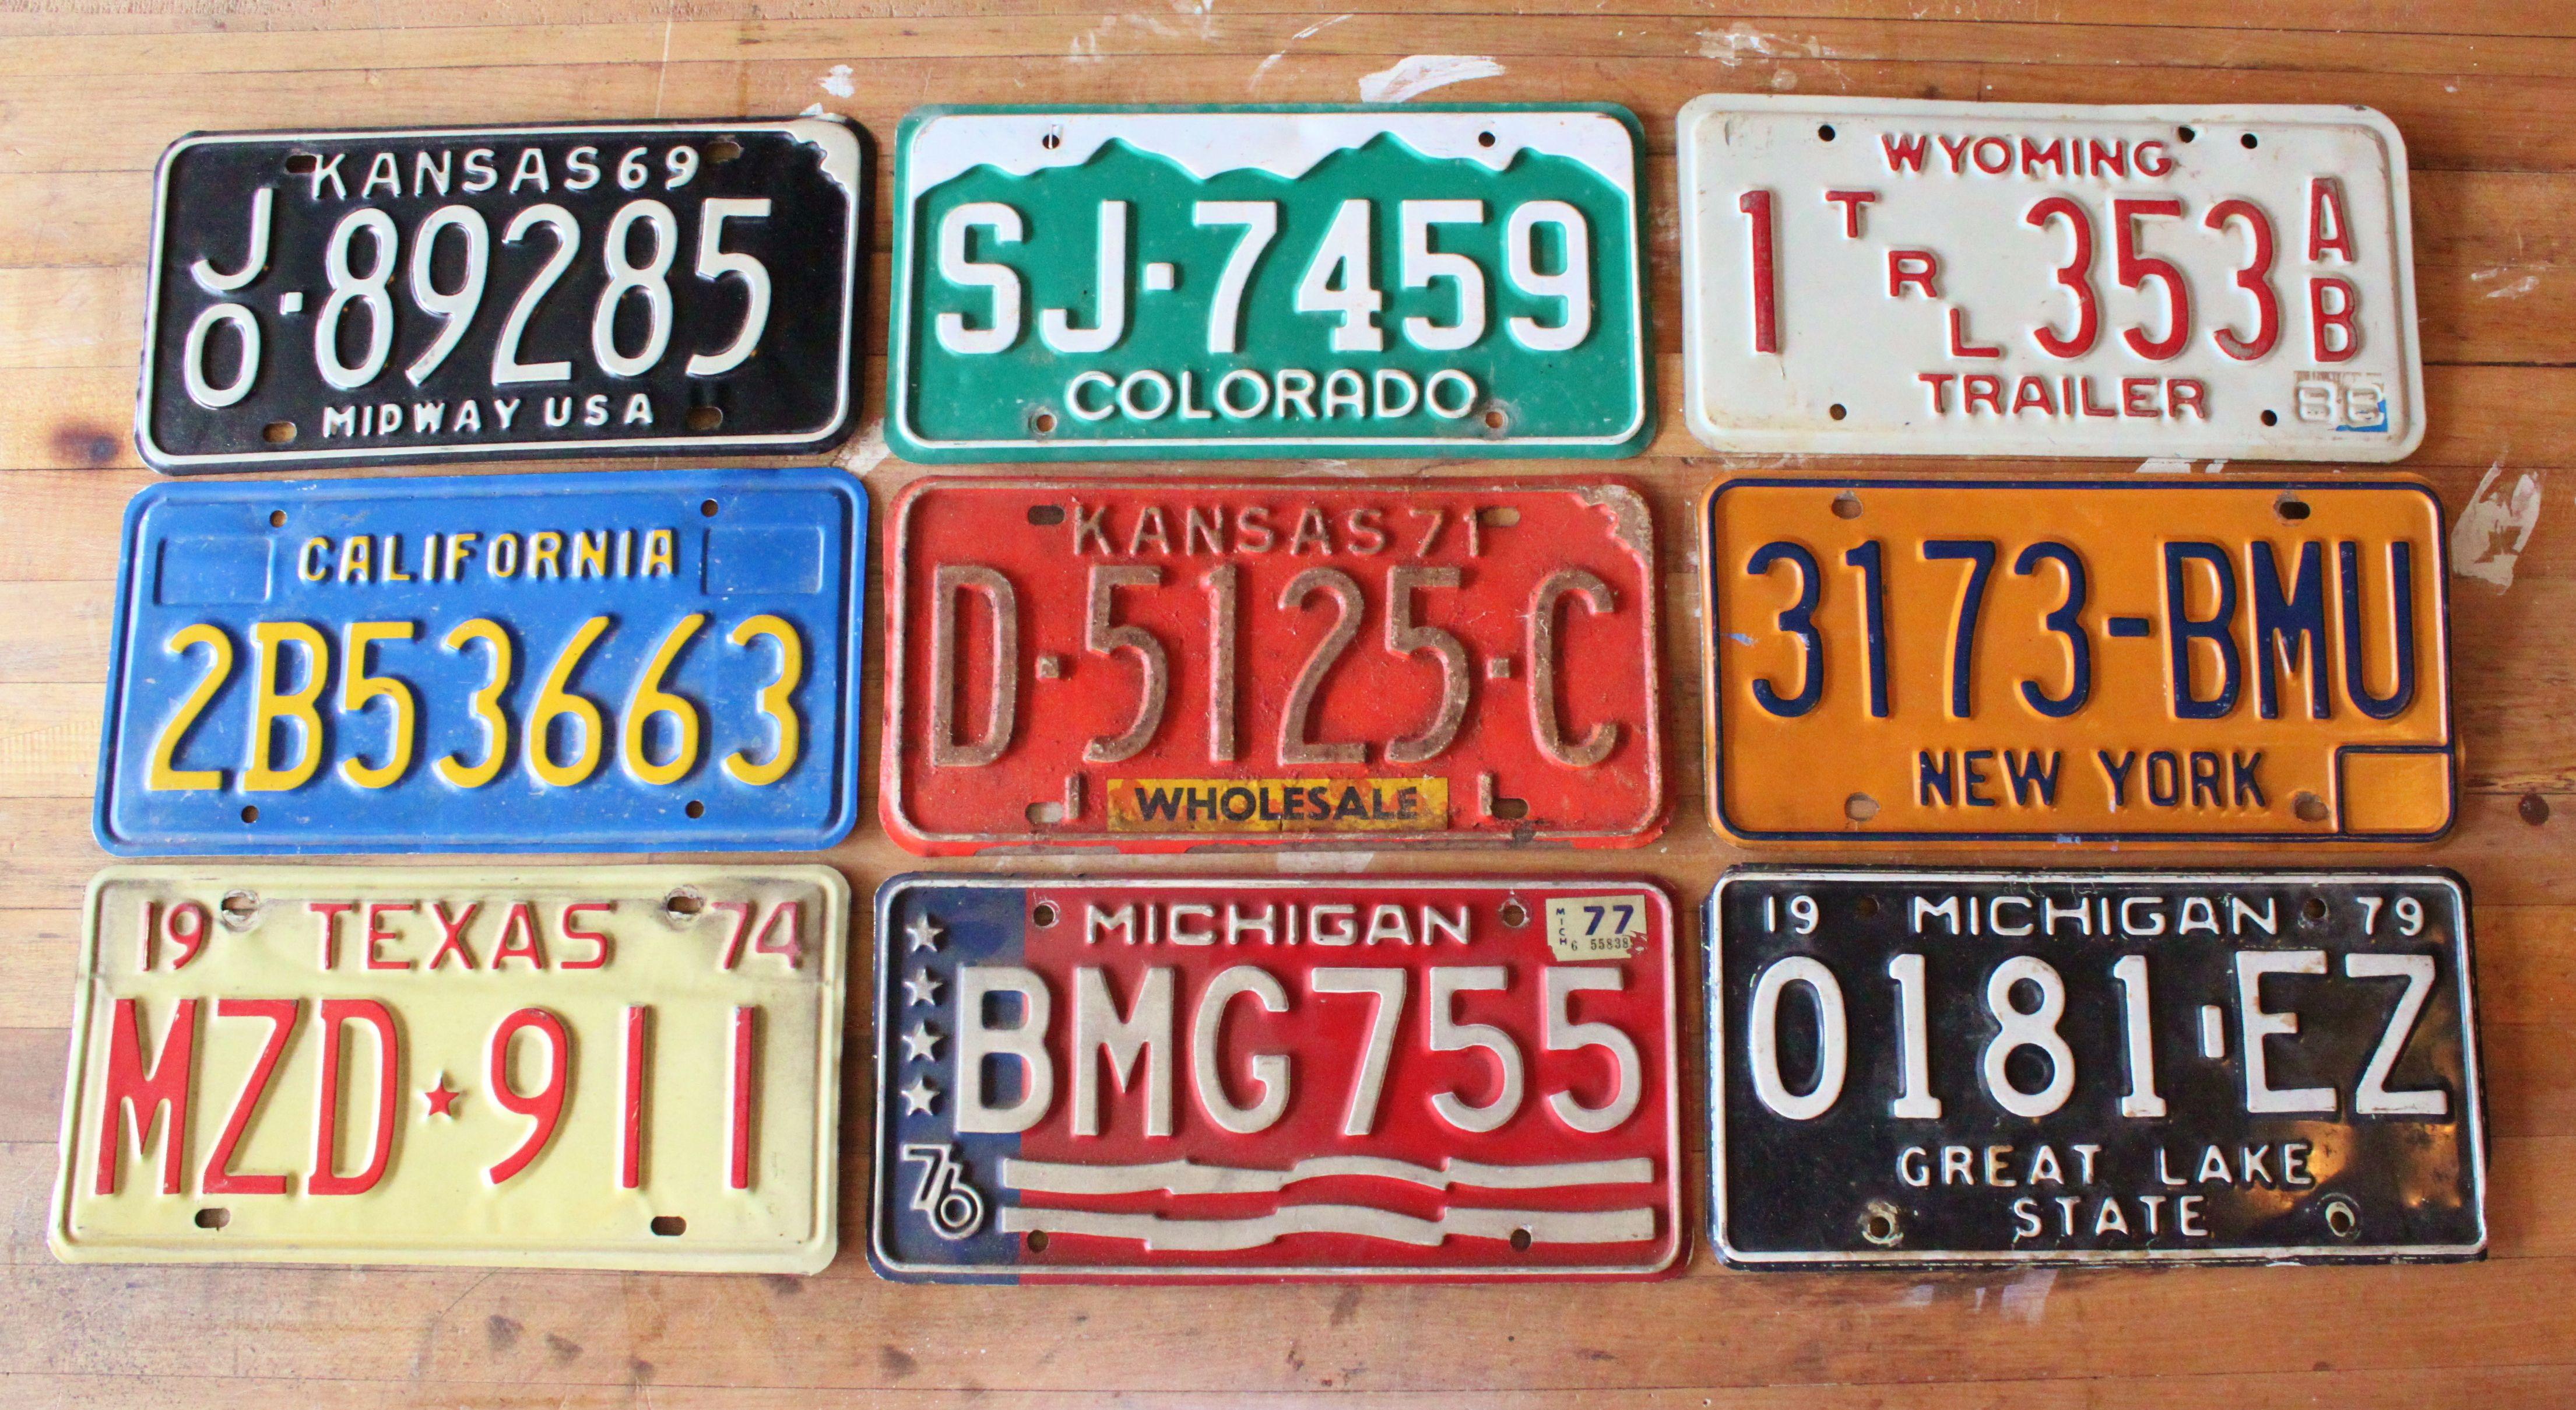 A Texas License Plate Becomes a Box | License plates, Craft fairs ...